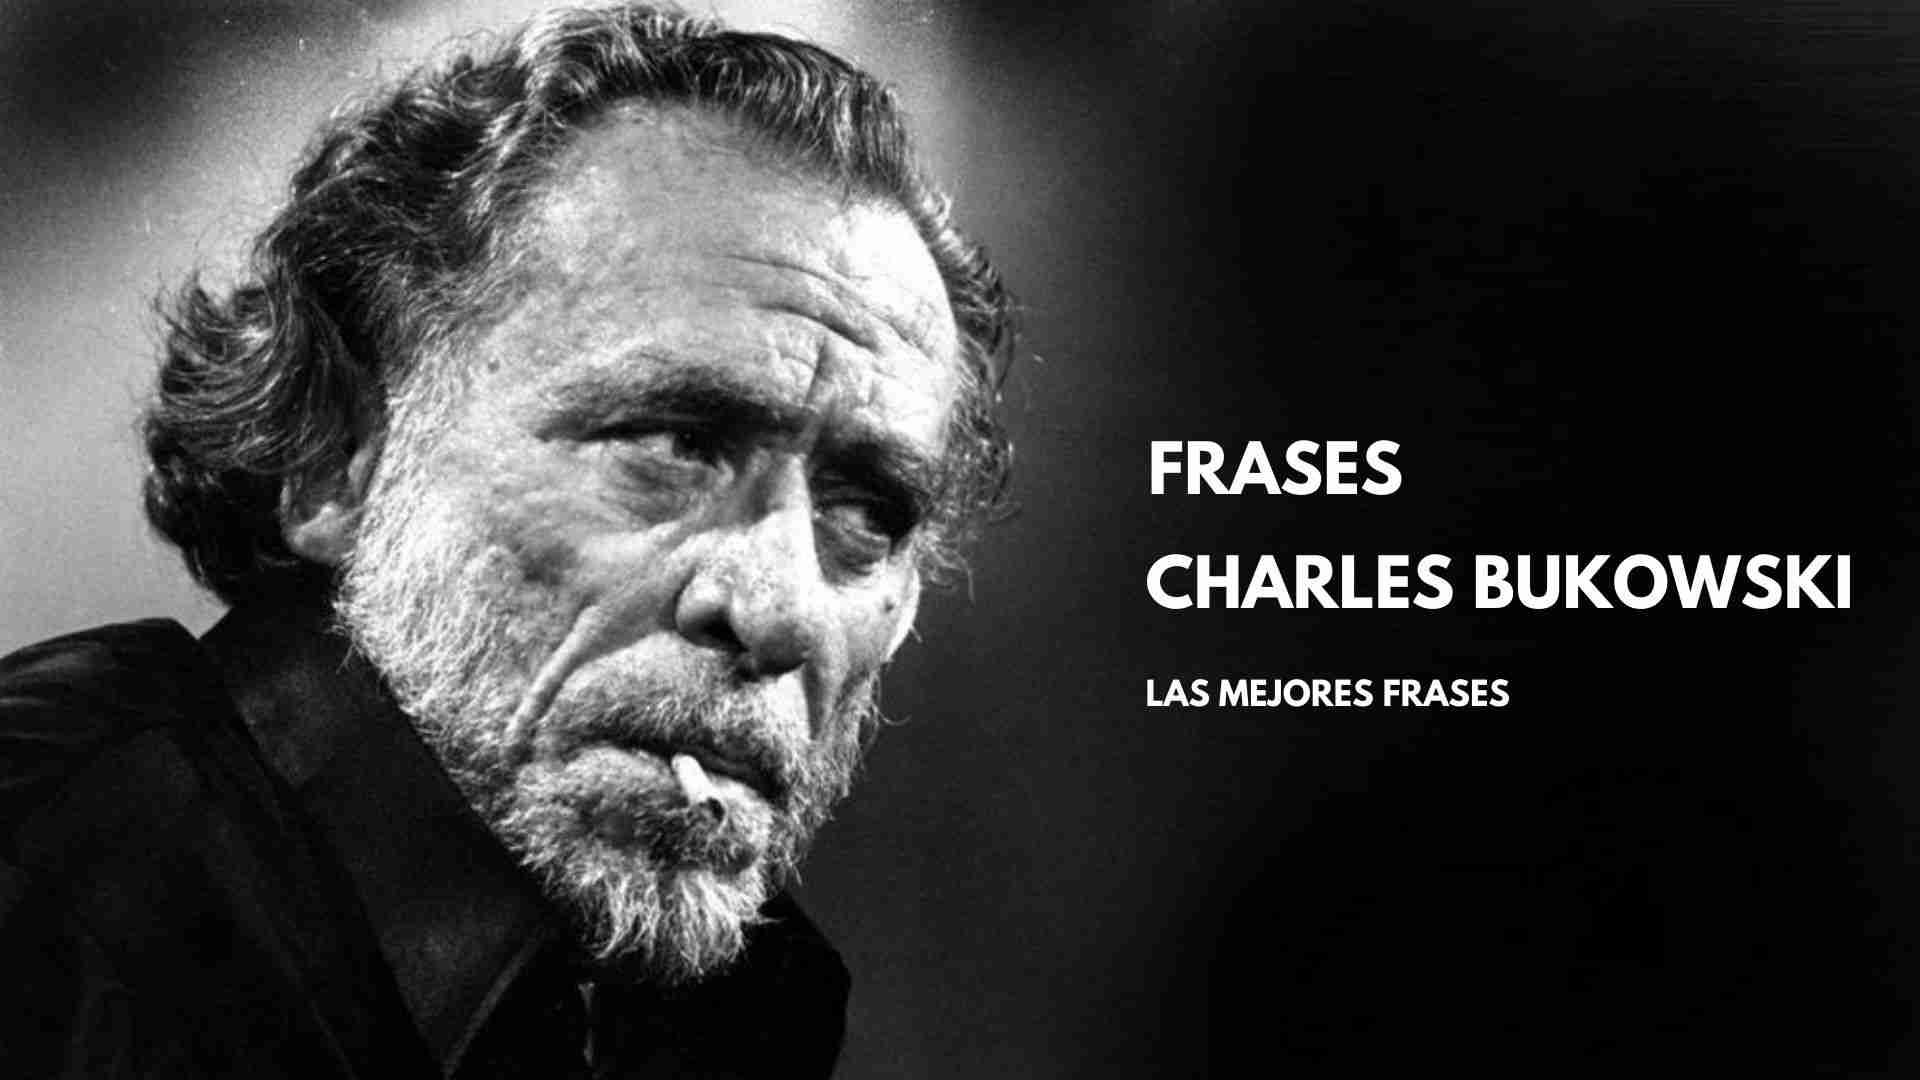 Las mejores frases de Charles Bukowski